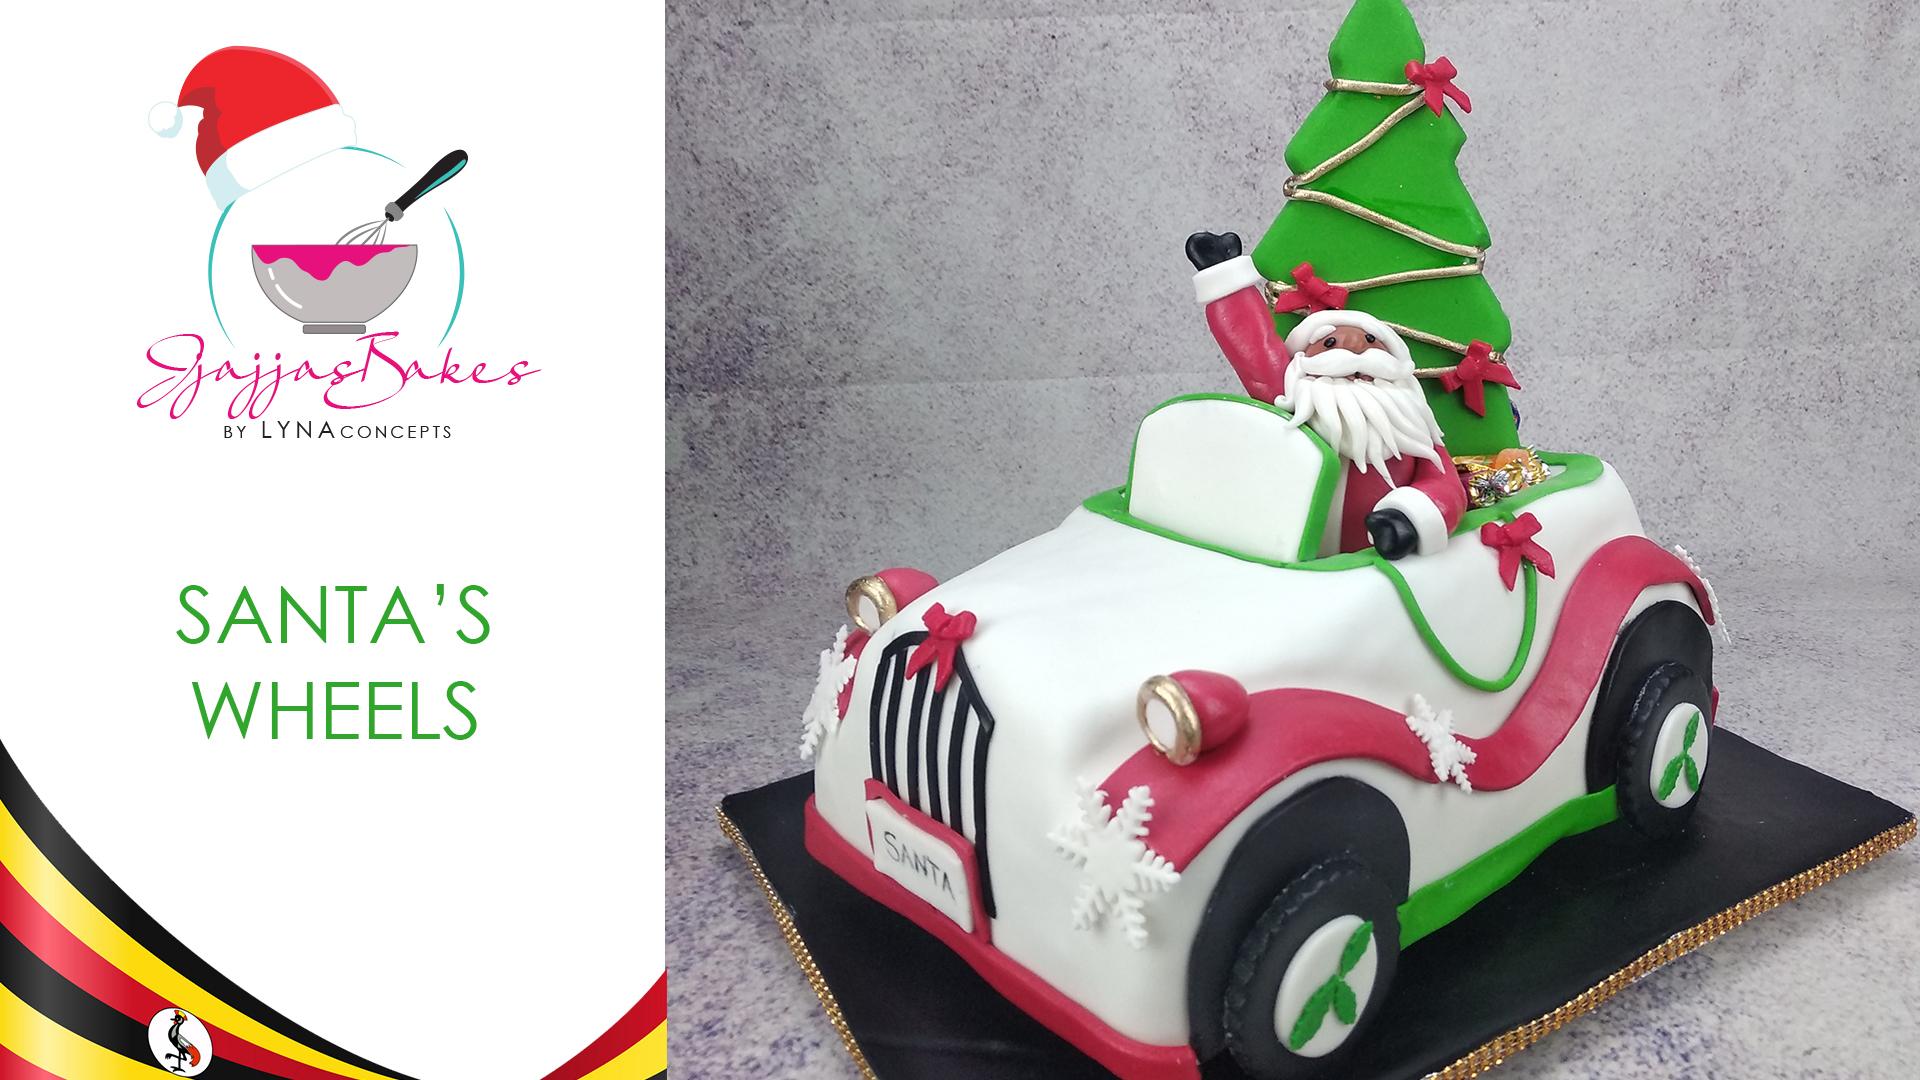 JjajjasBakes_Santas_Wheels_youtube